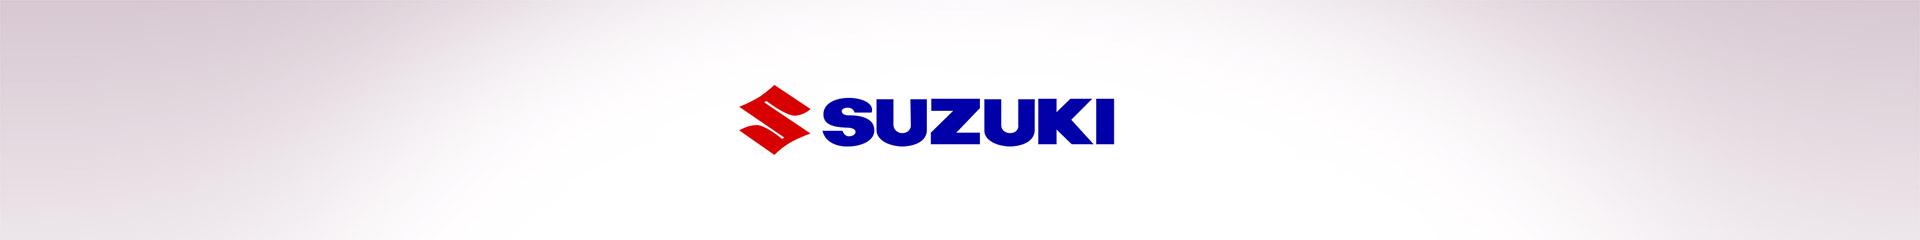 Ricambi Moto Suzuki On Line